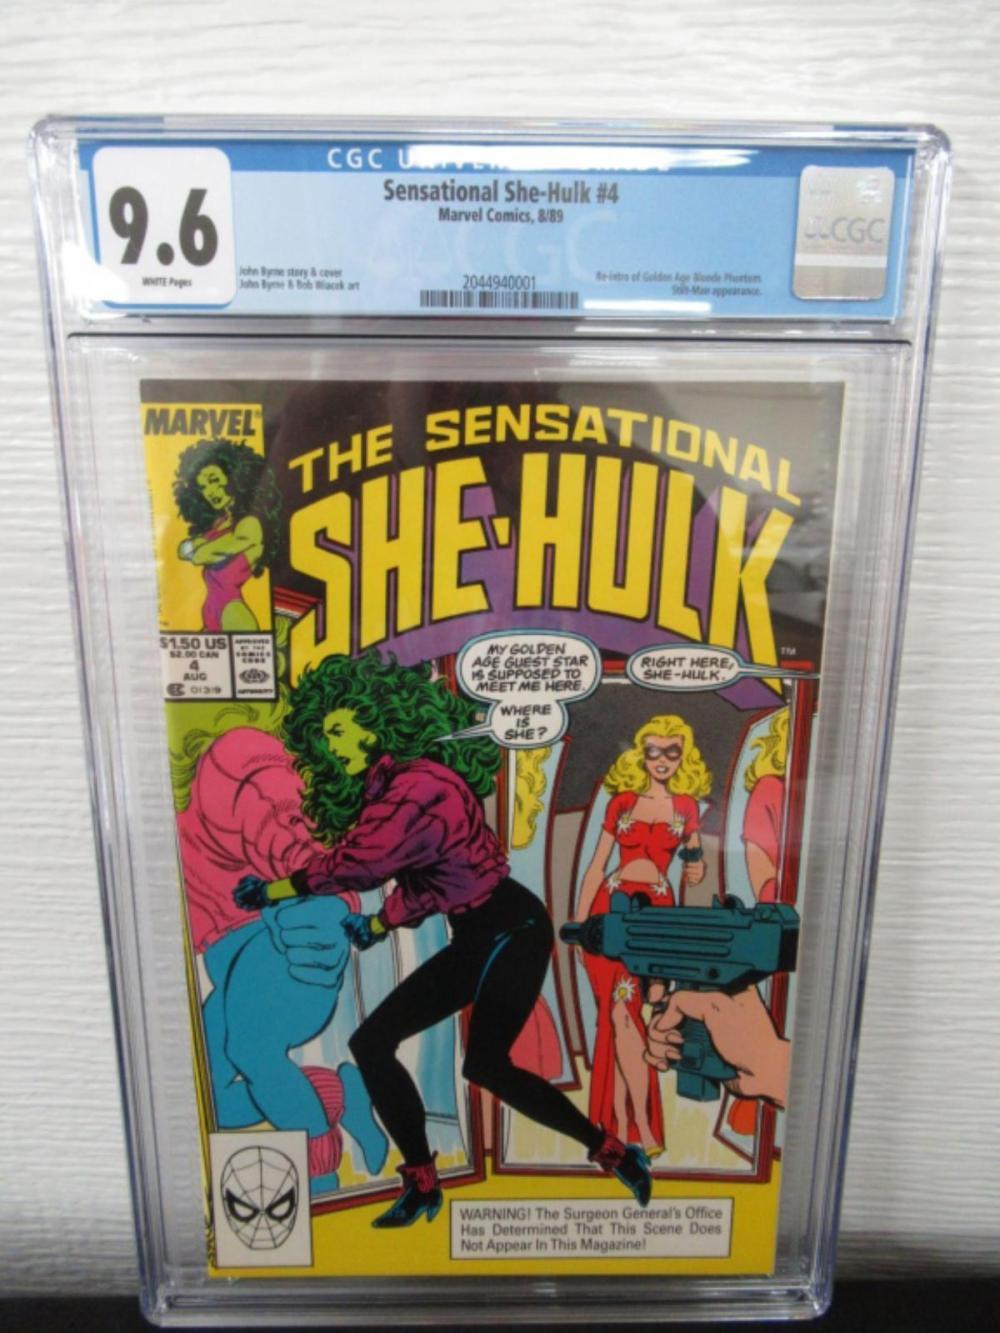 Sensational She-Hulk #4 CGC 9.6 re-intro Blonde